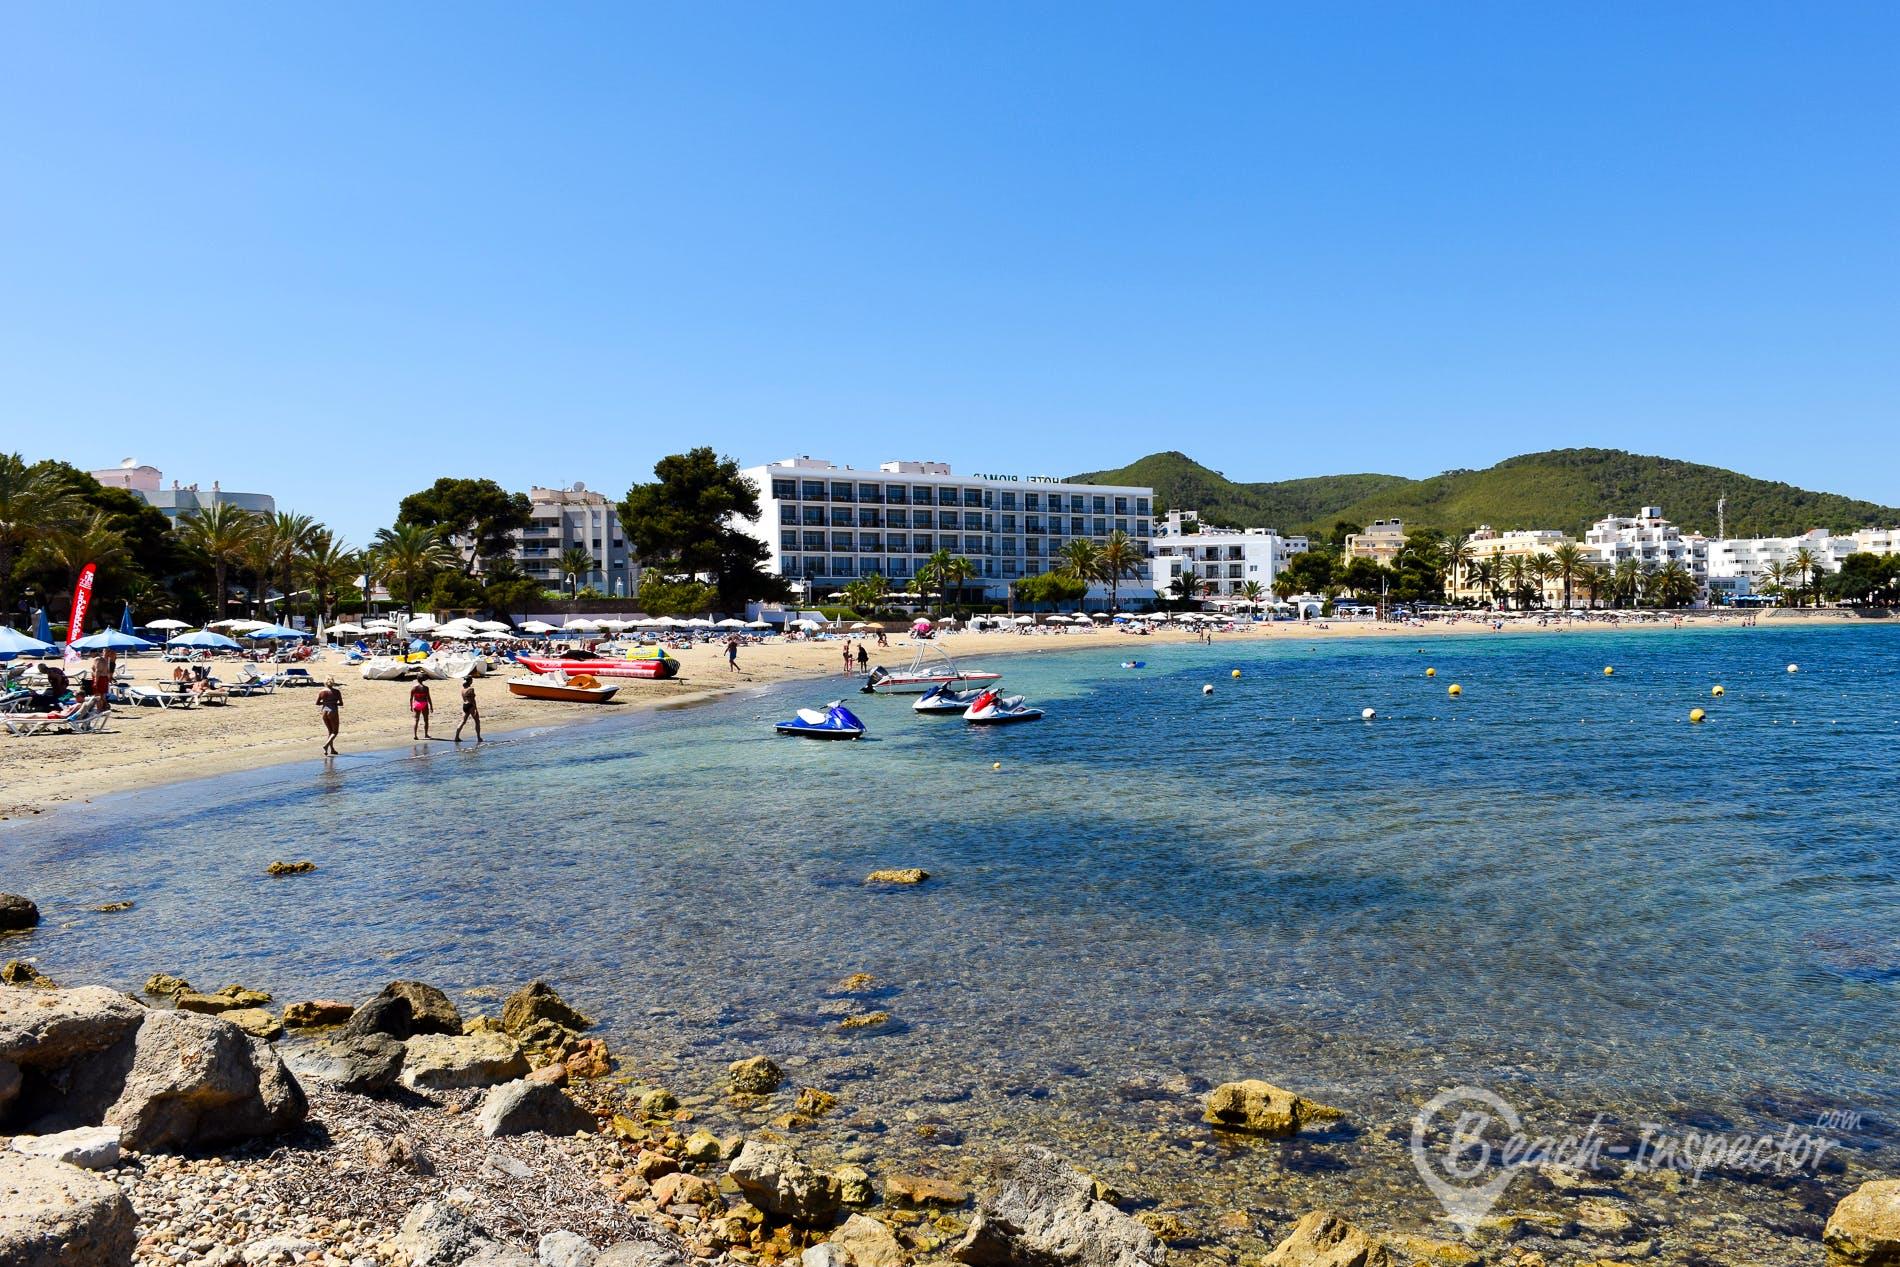 Beach Playa del Rio, Ibiza, Spain